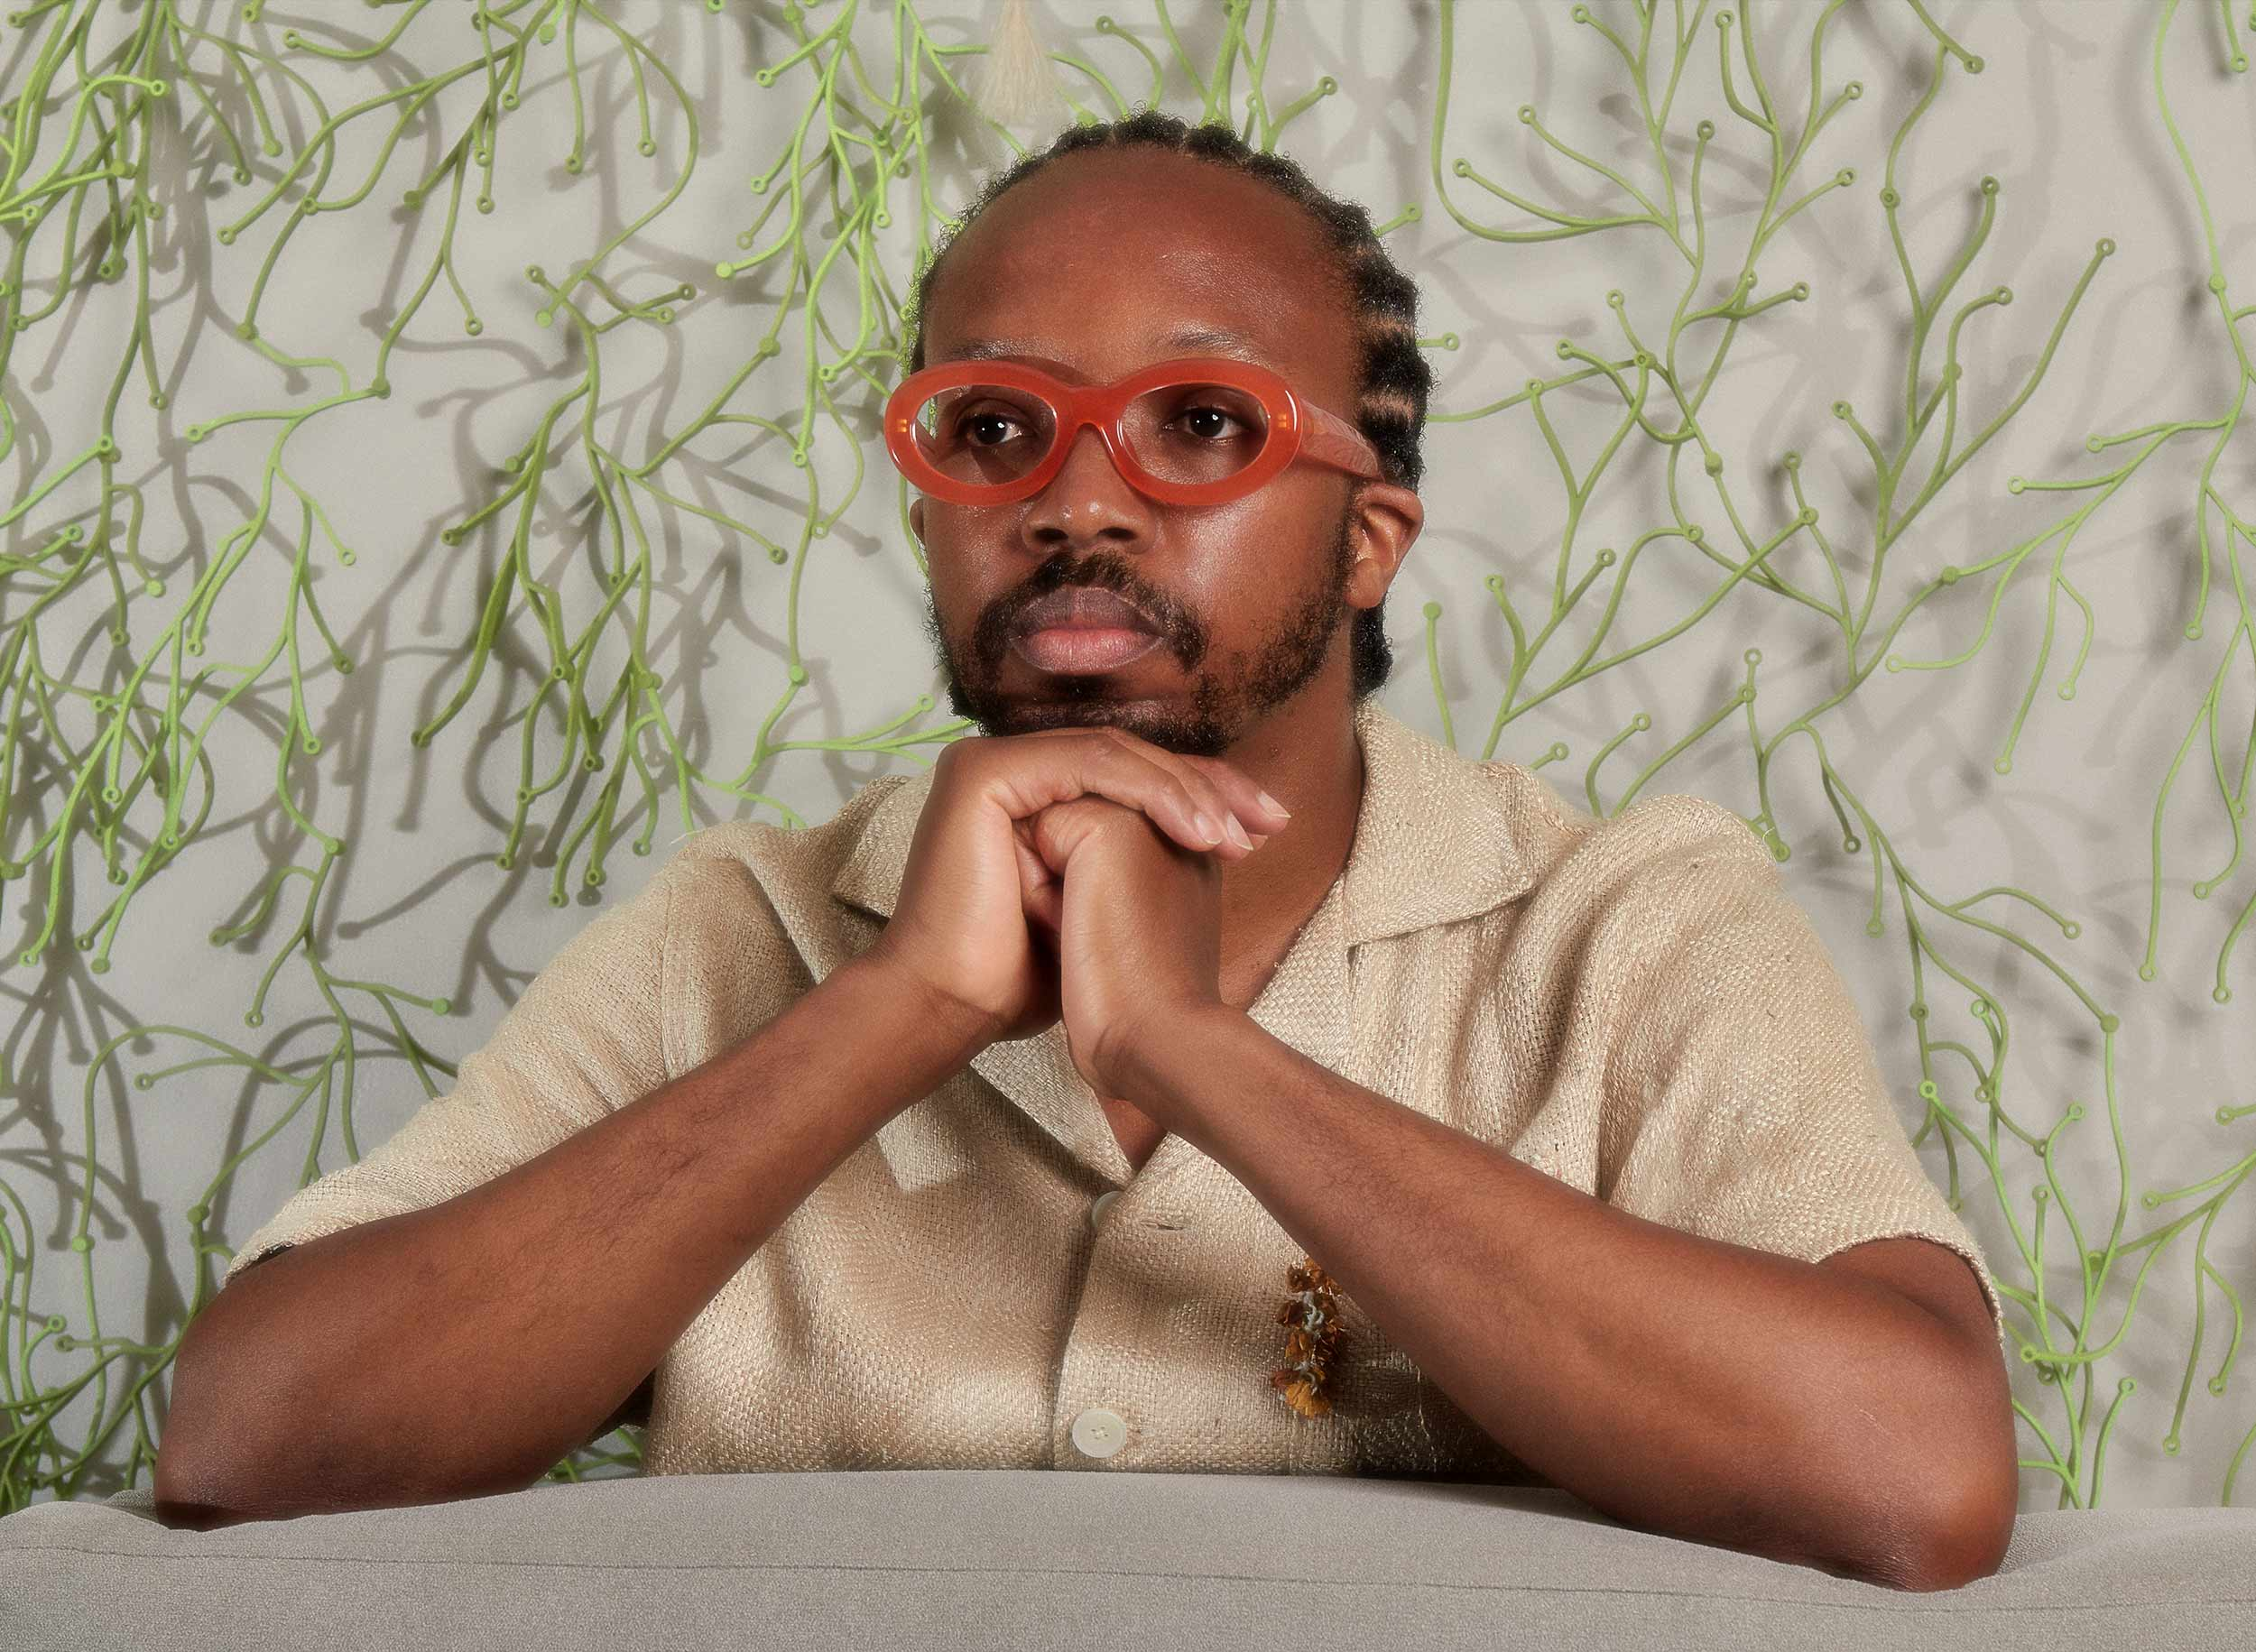 Ekene Ijeoma reveals the revolutionary potential of data-based art